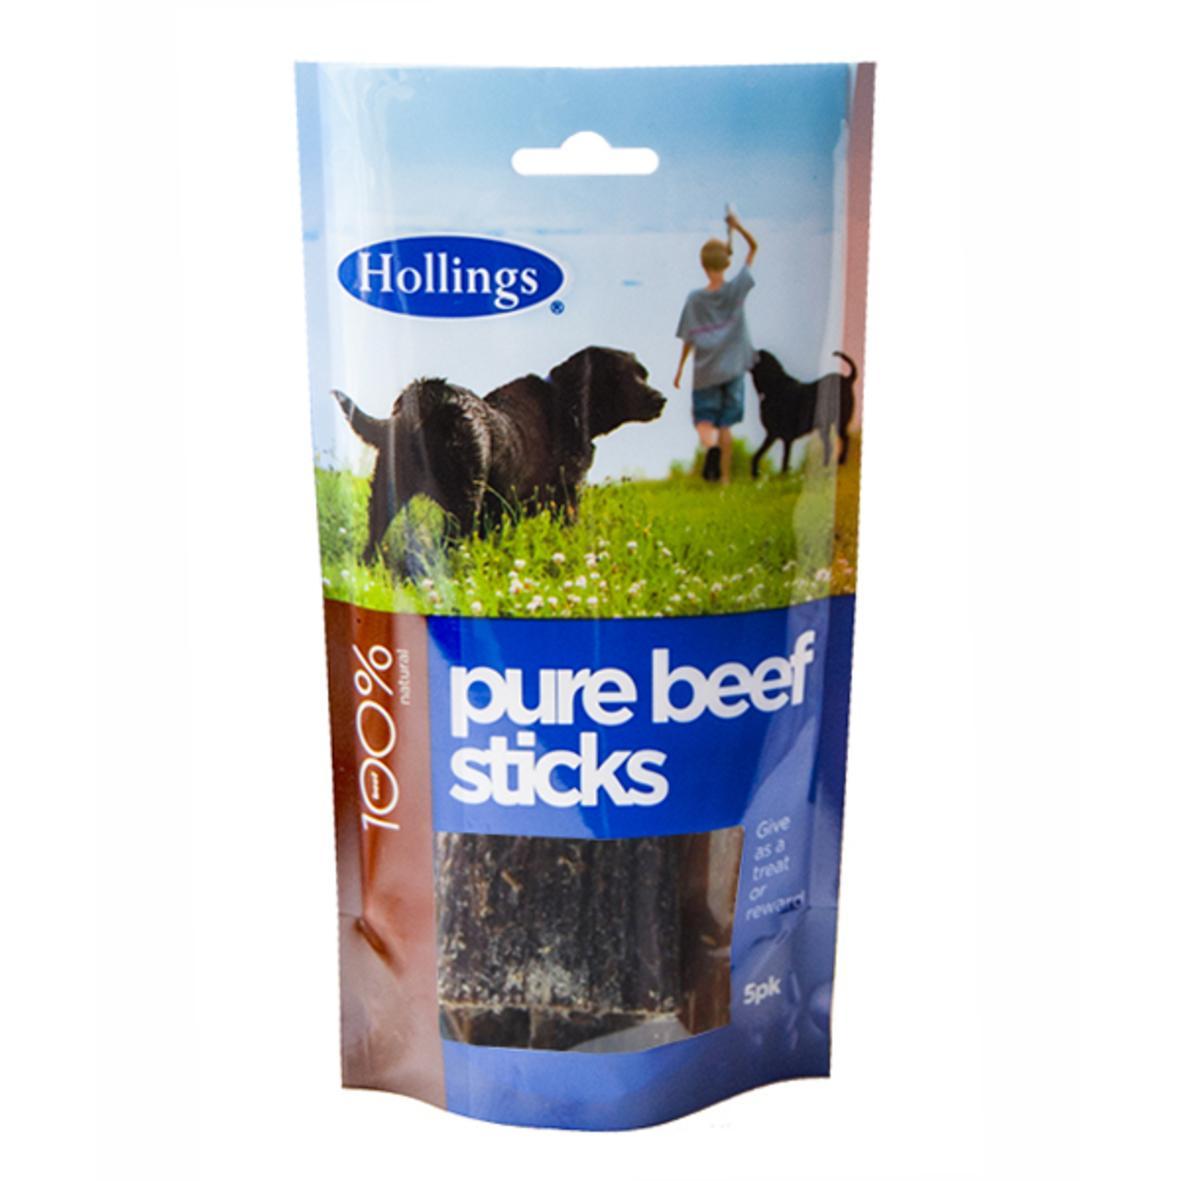 Hollings Pure Beef Sticks 5pcs